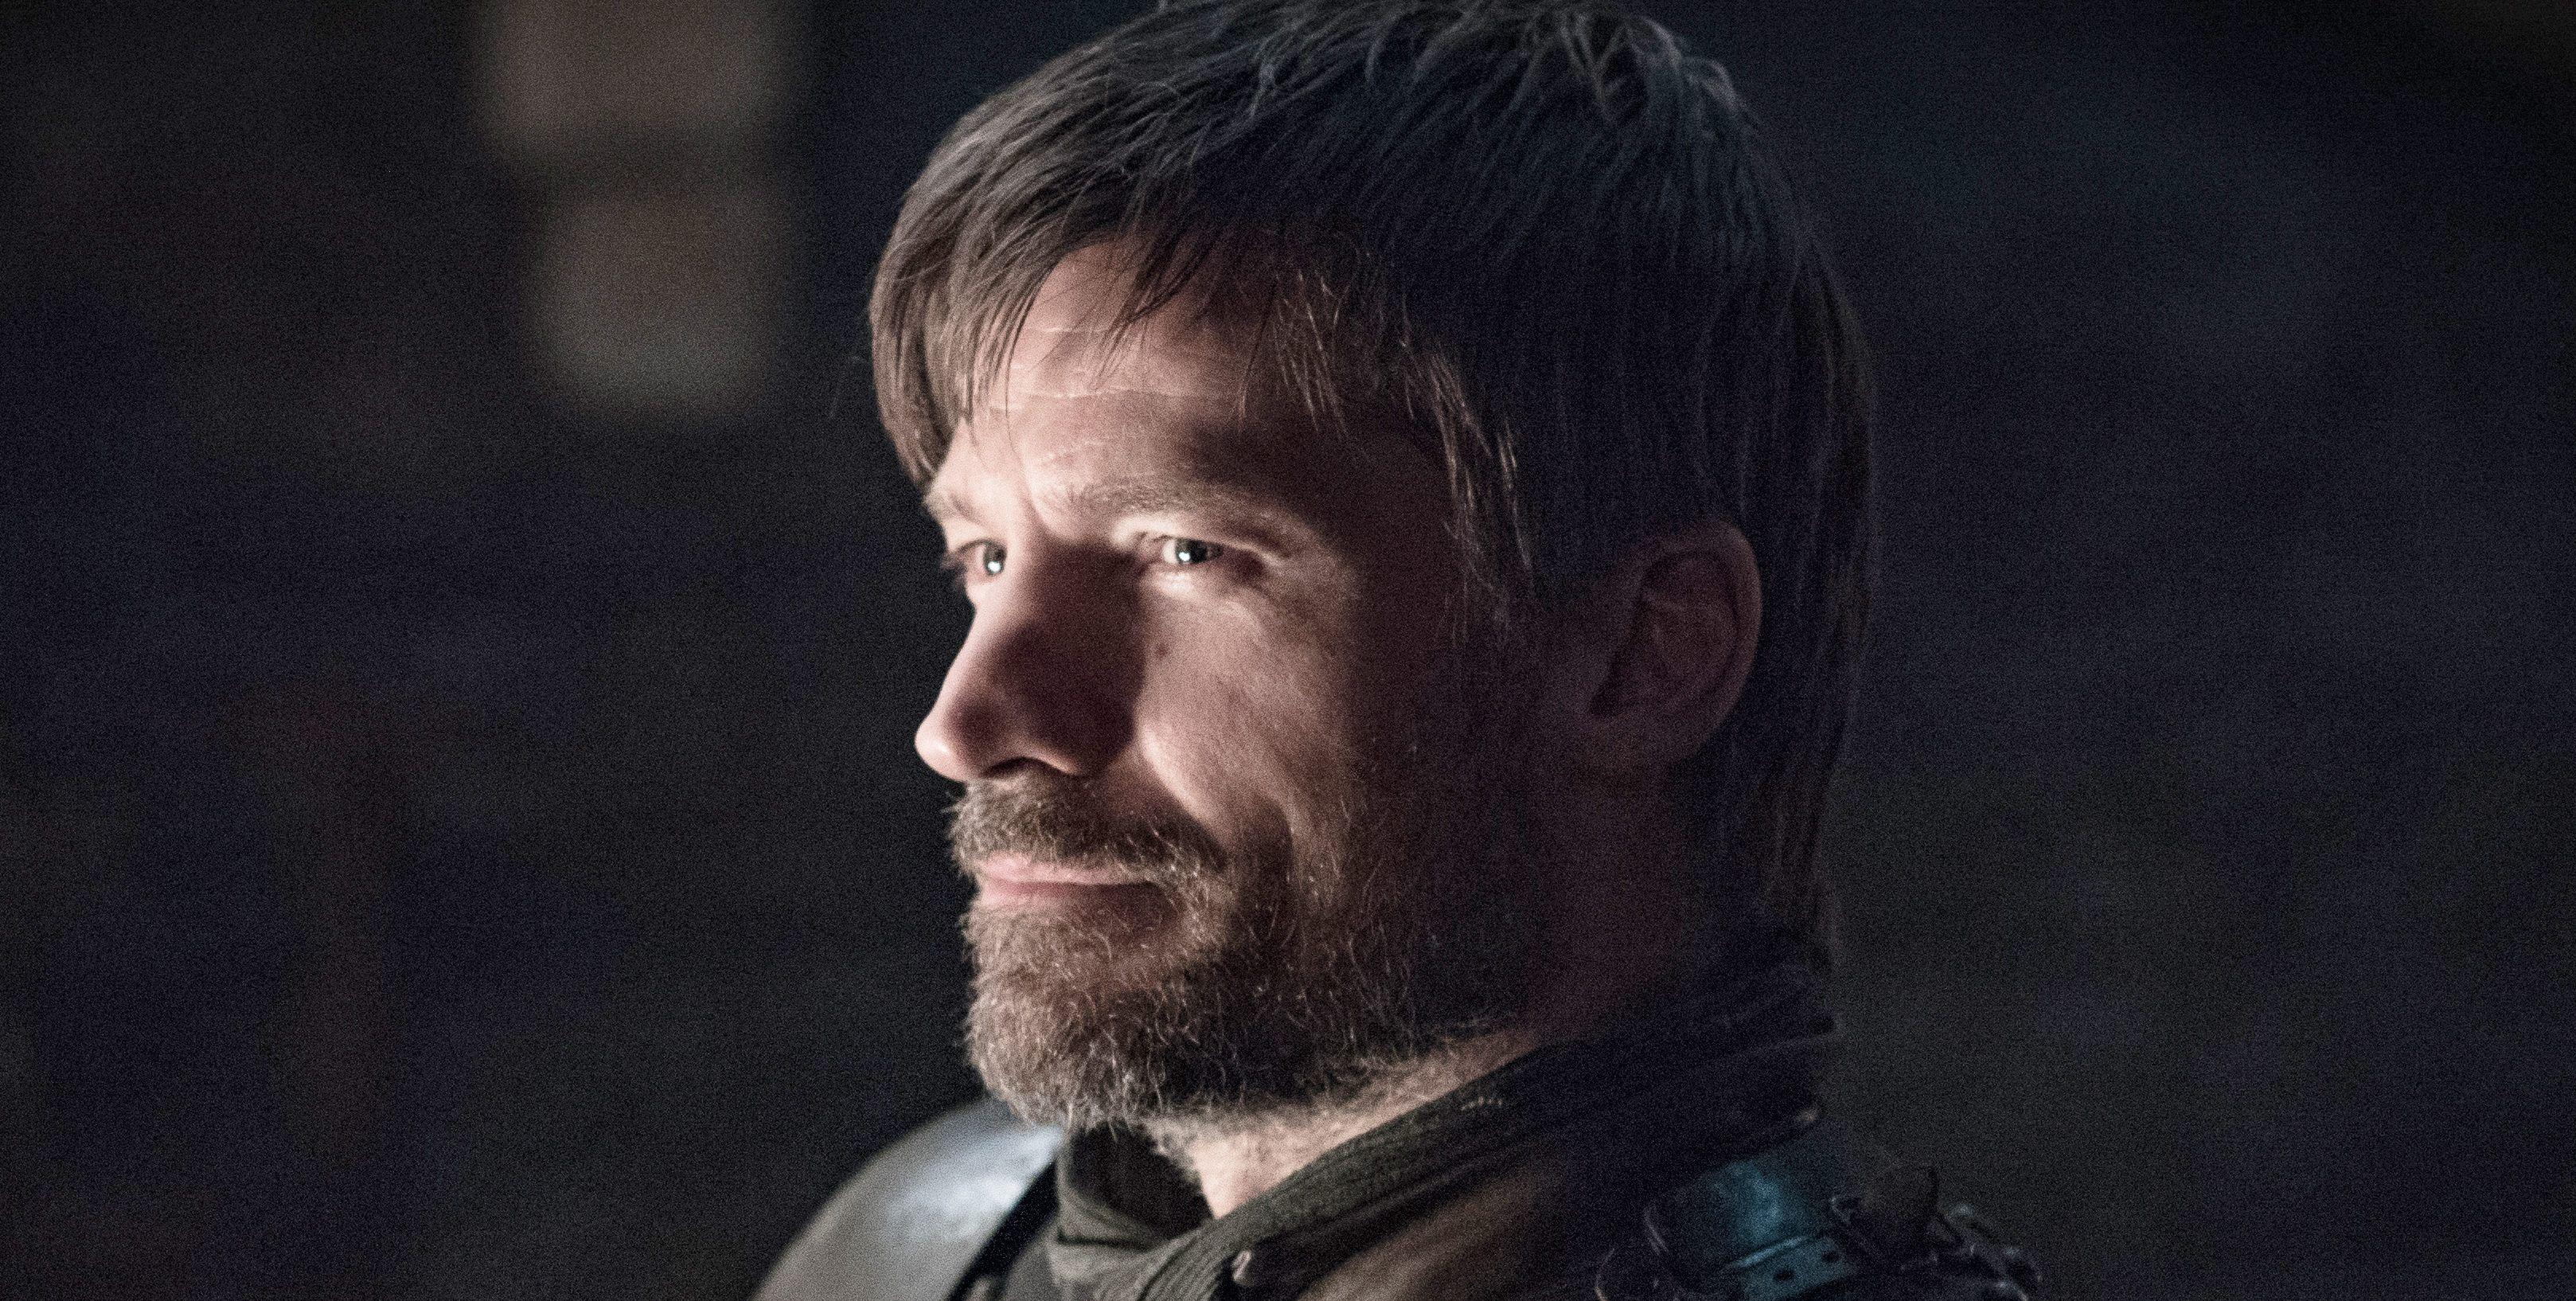 Game of Thrones, Season 8, Jaime Lannister, Nikolaj Coster-Waldau